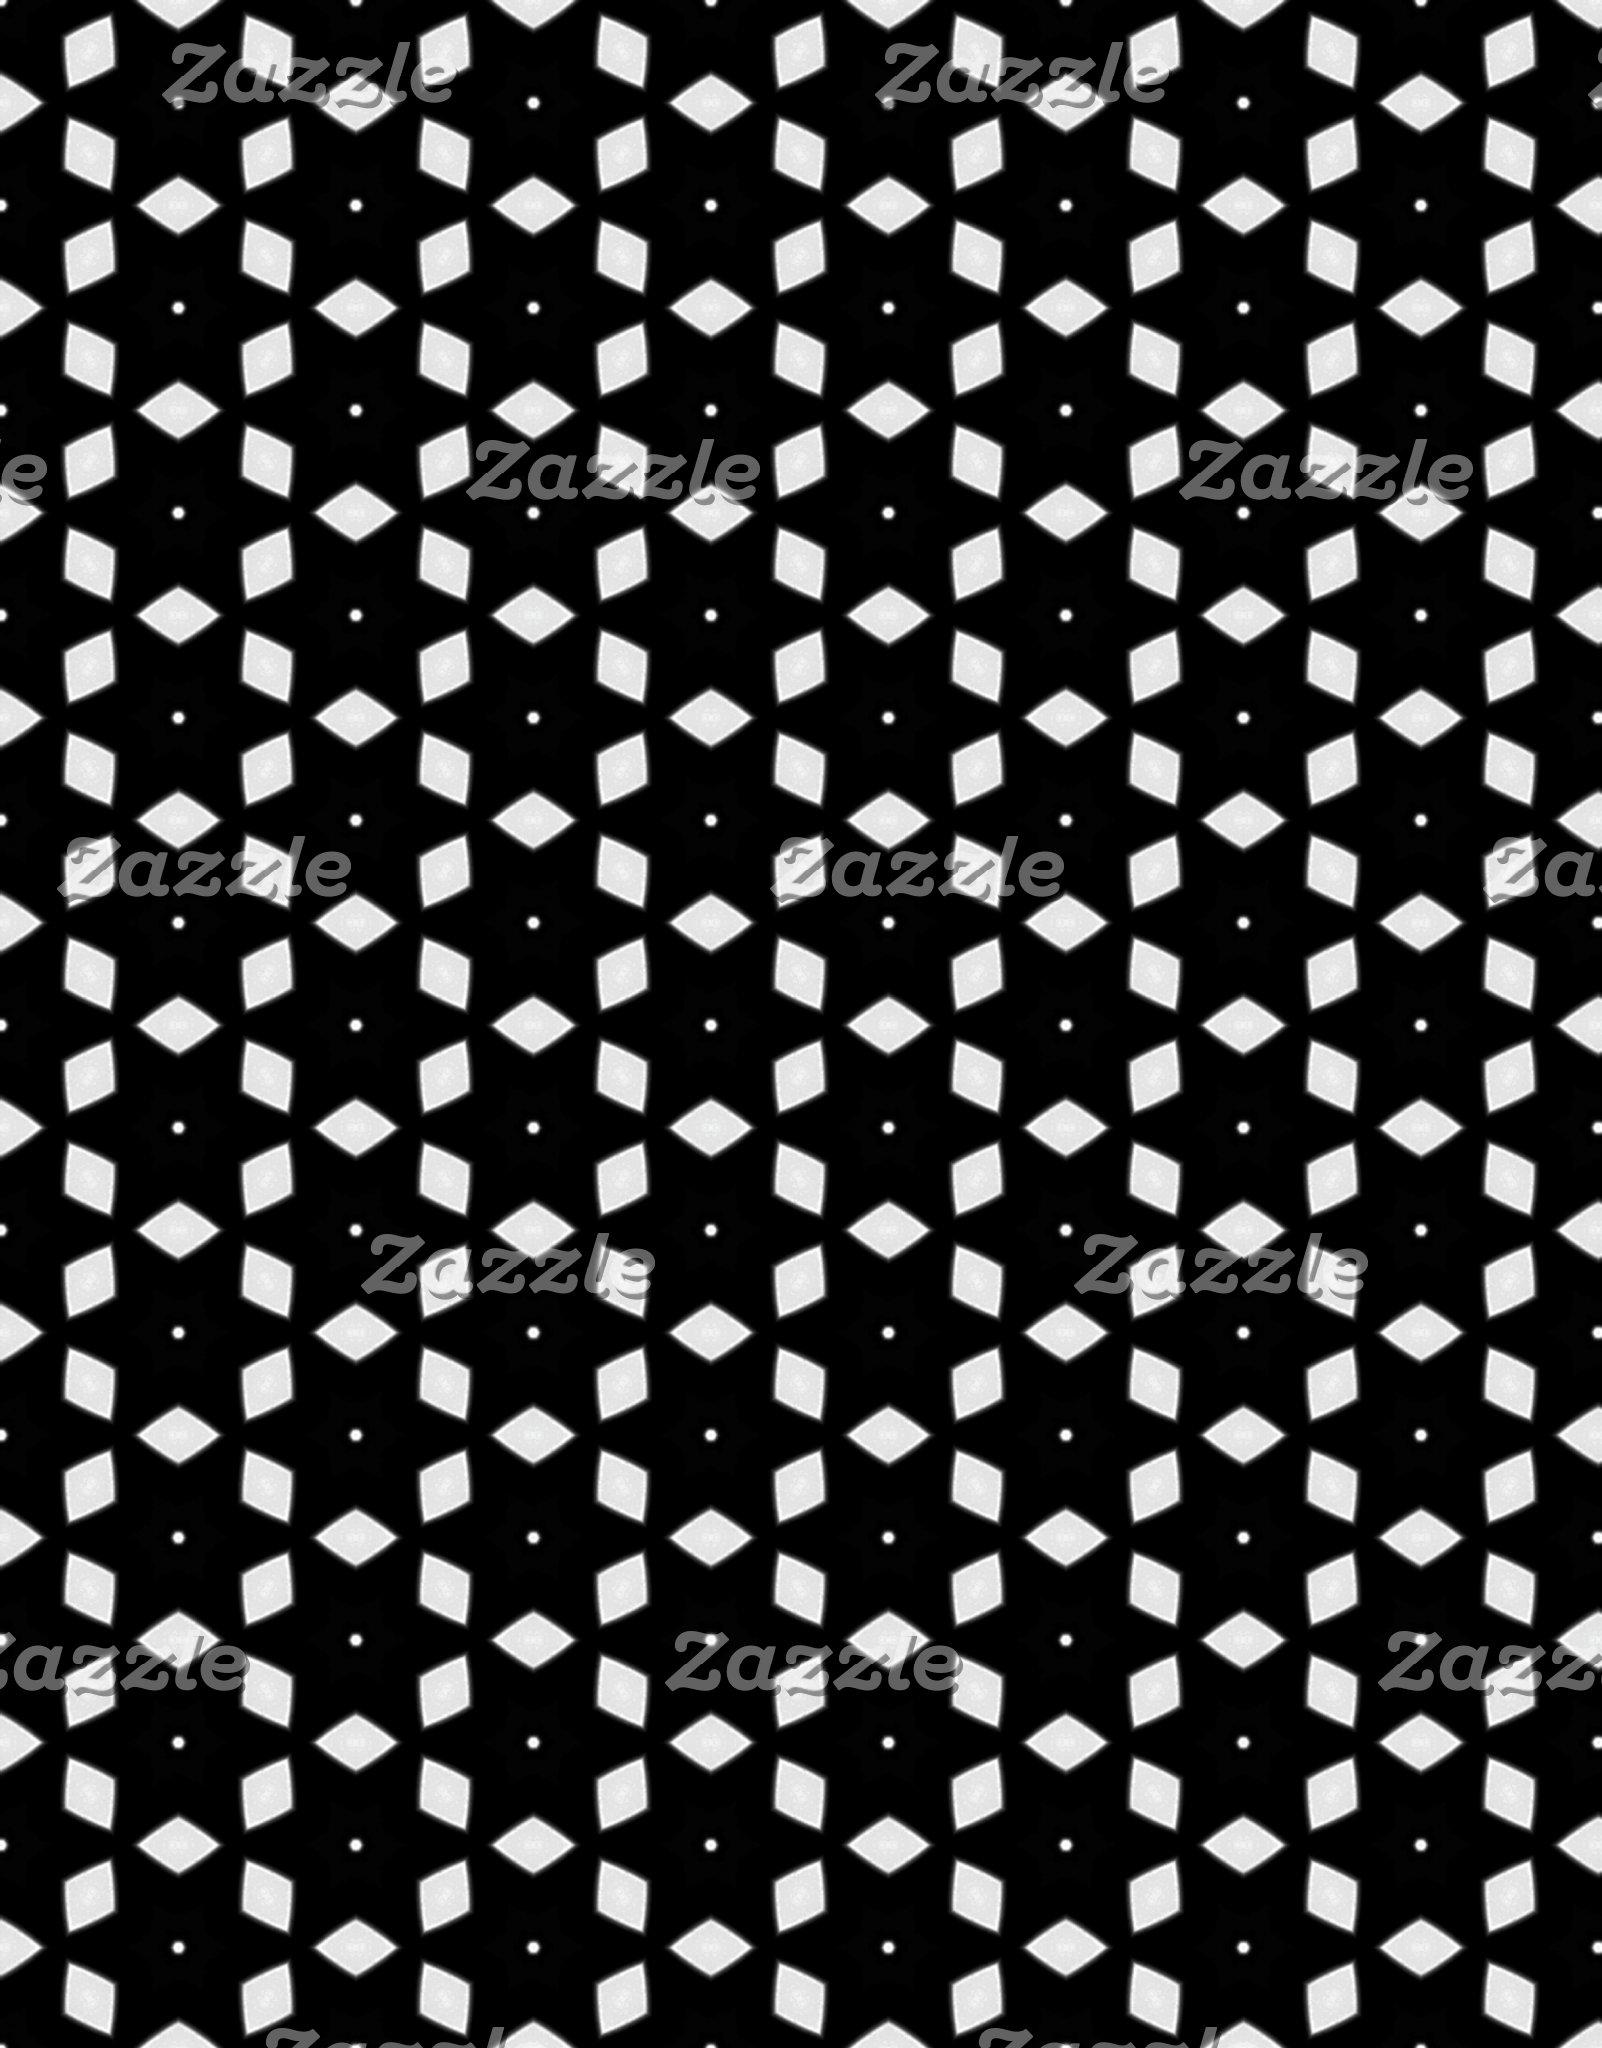 Black and White Patterns | Diamonds and Stars I